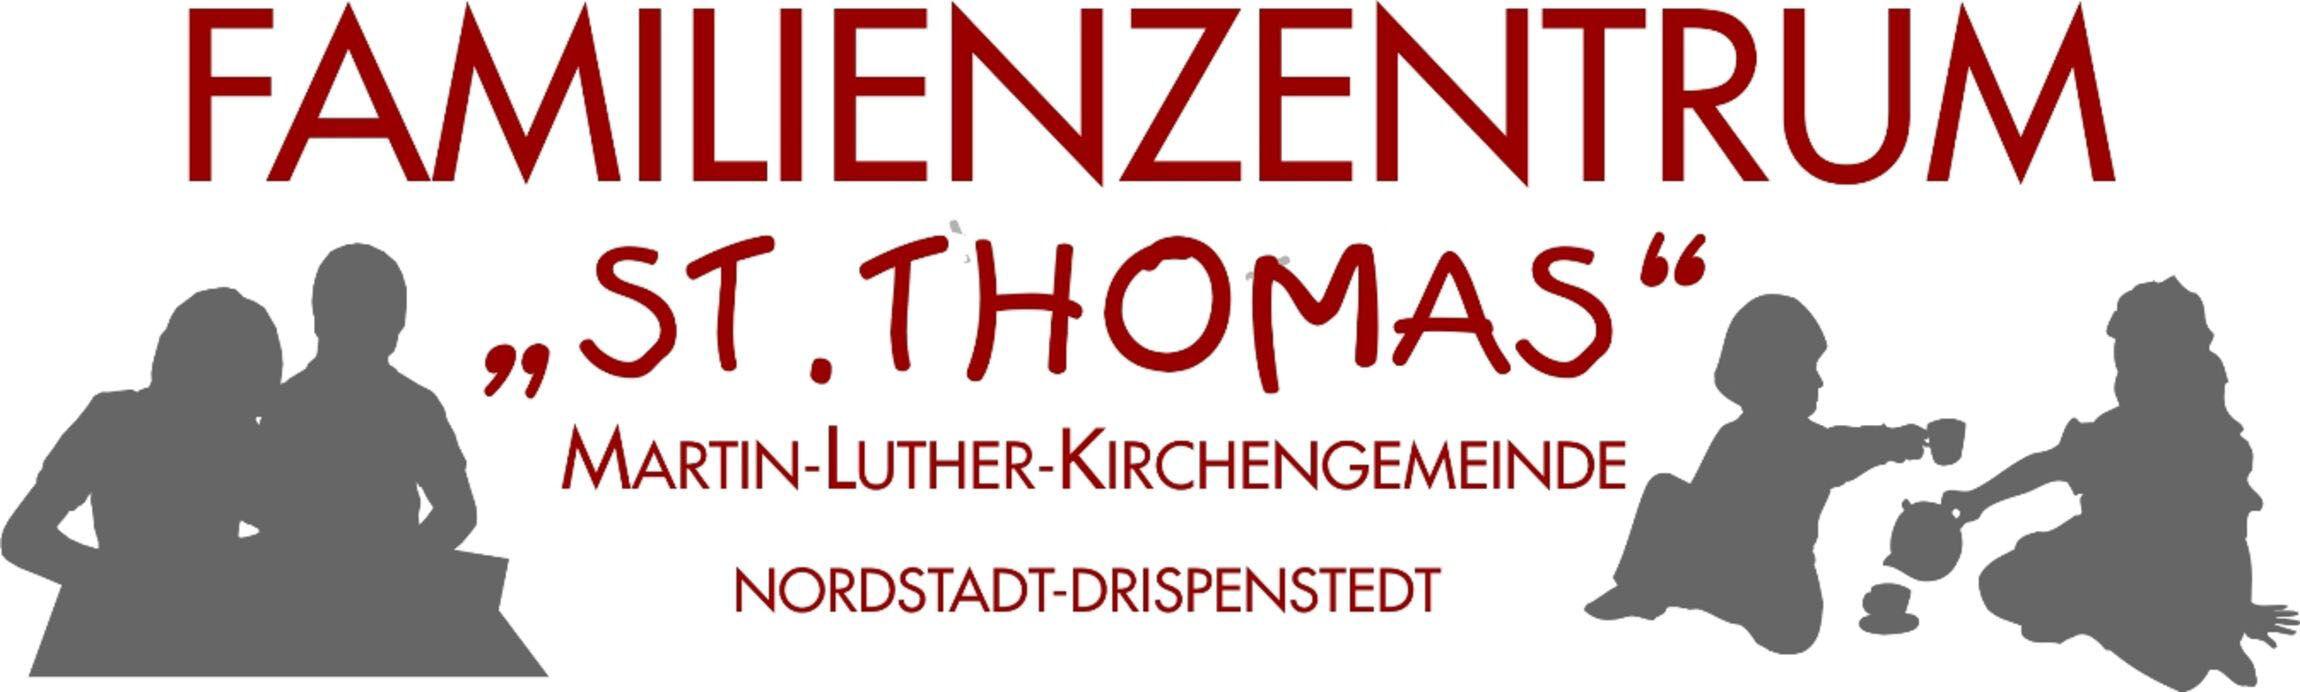 Logo Familienzentrum St. Thomas